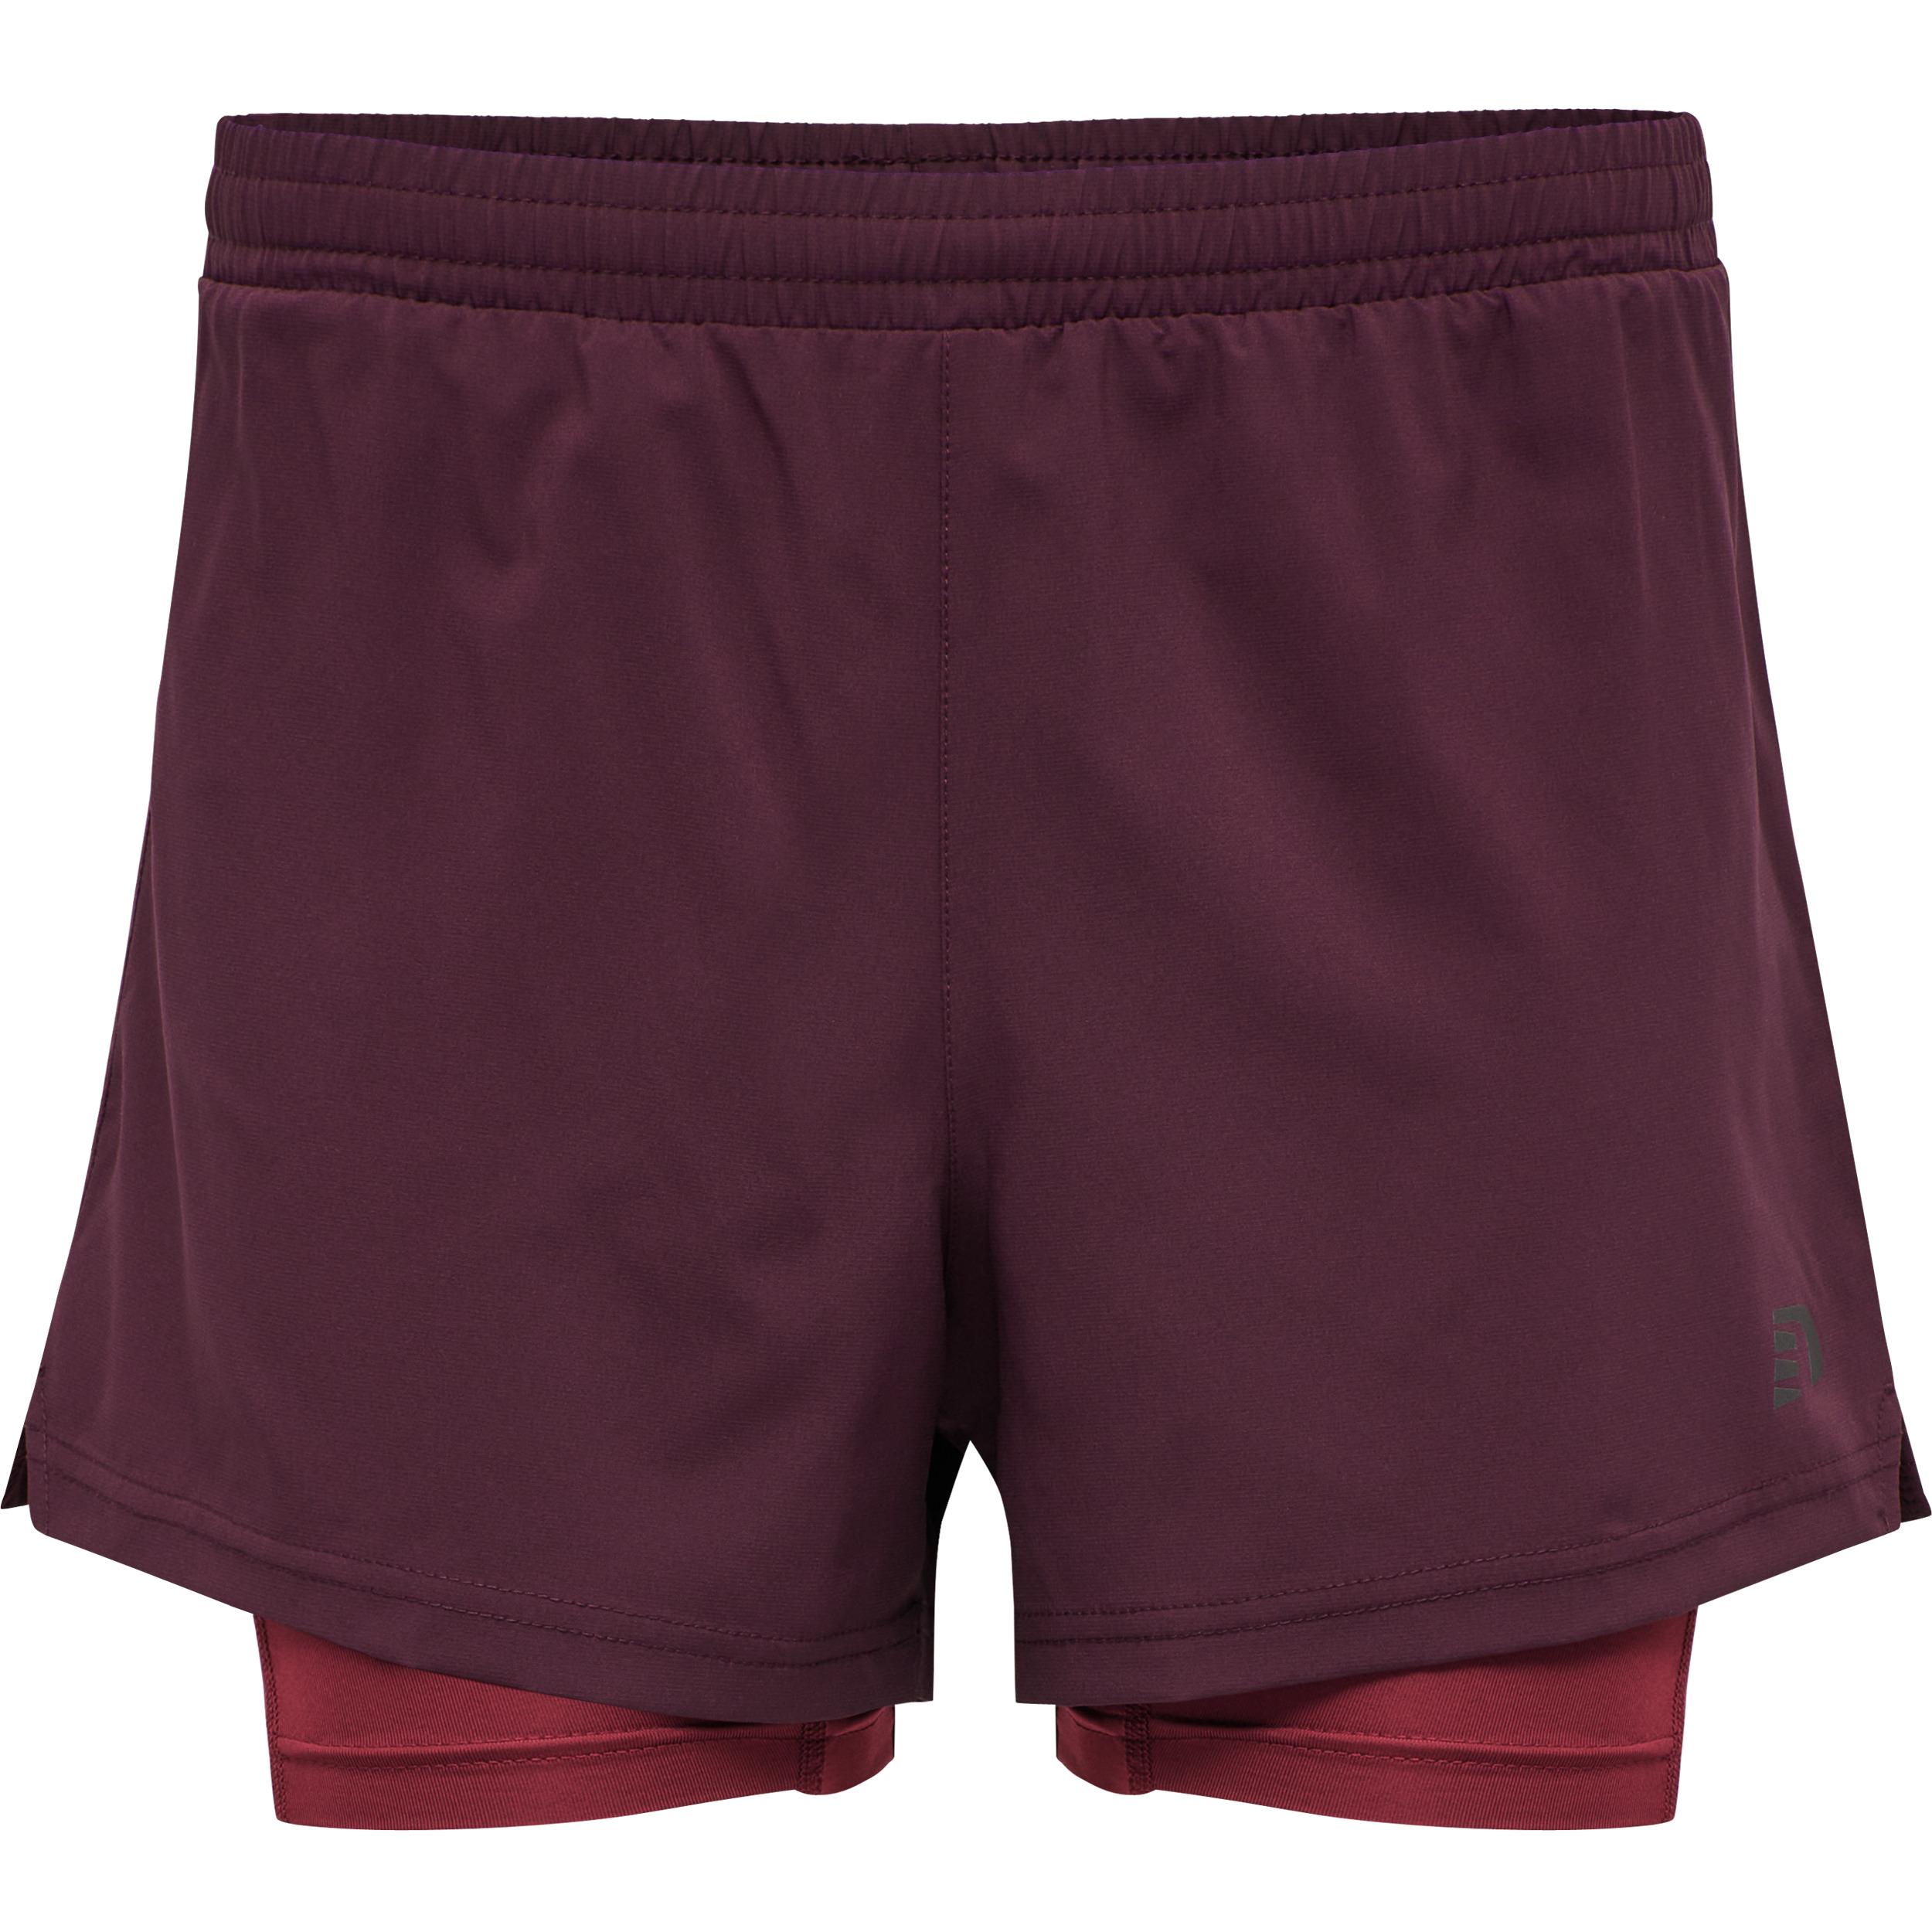 Newline W 2-in-1 shorts